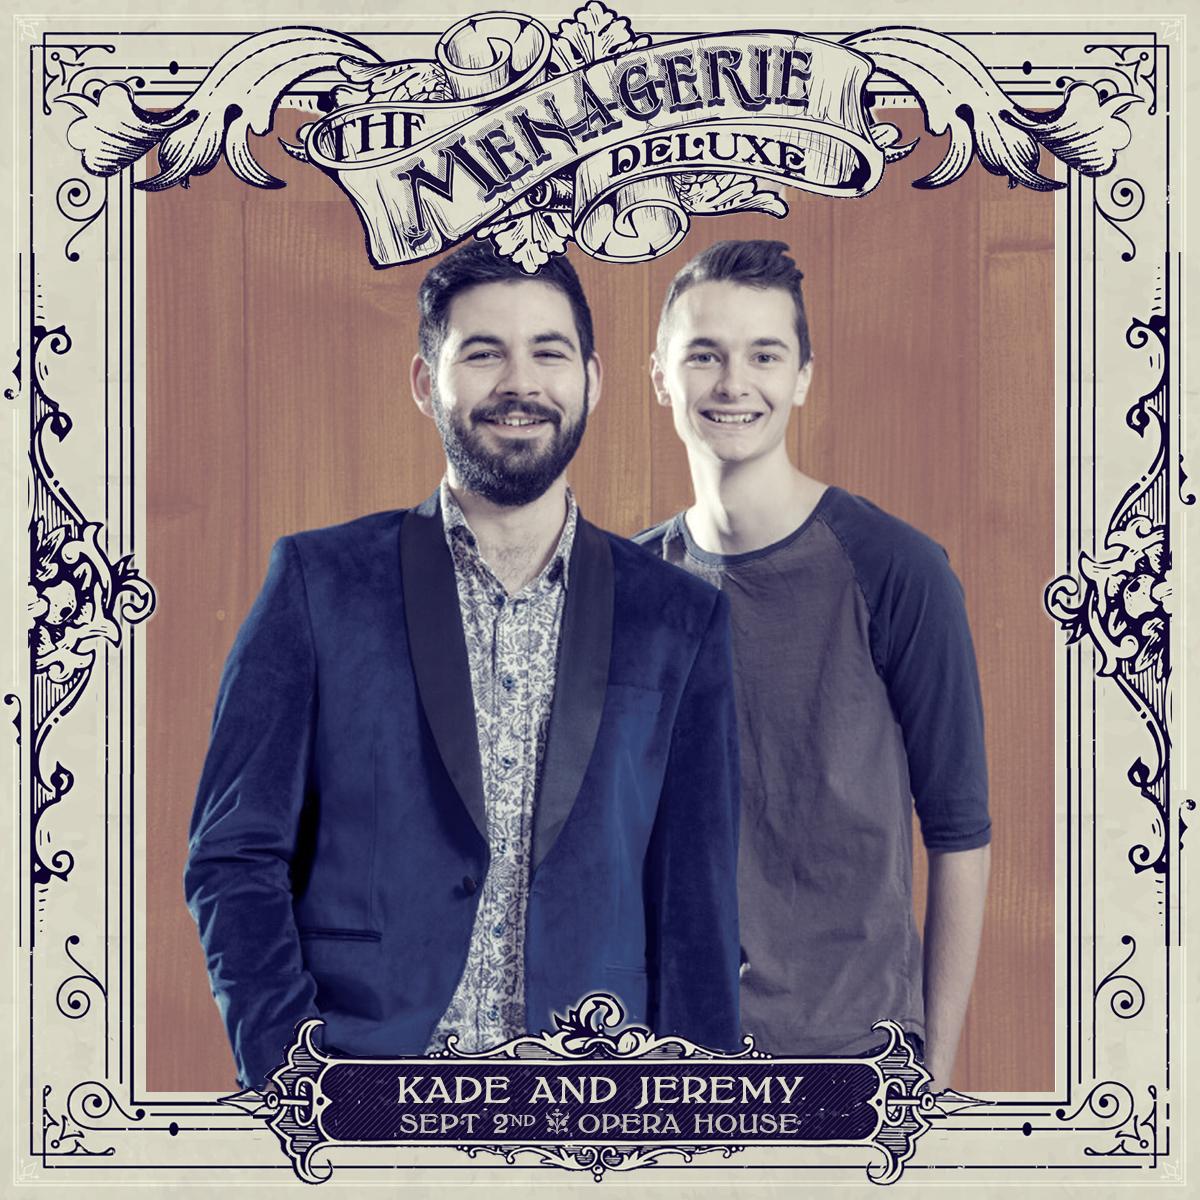 Kade and Jeremy - Comedy Magic